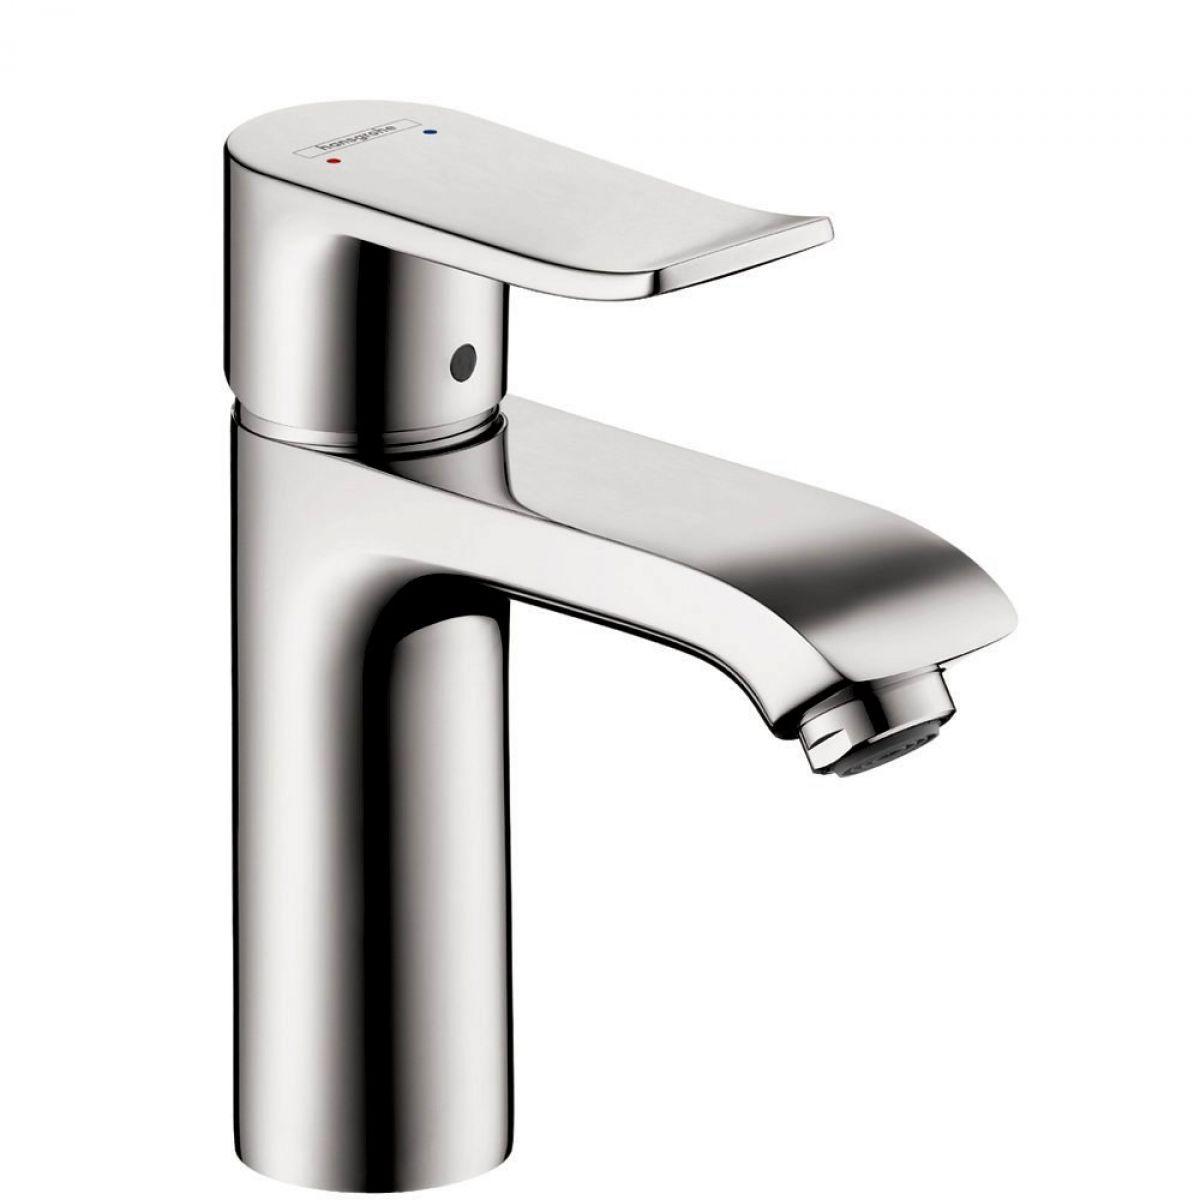 Hansgrohe Metris 110 Basin Mixer | Bathrooms Direct Yorkshire